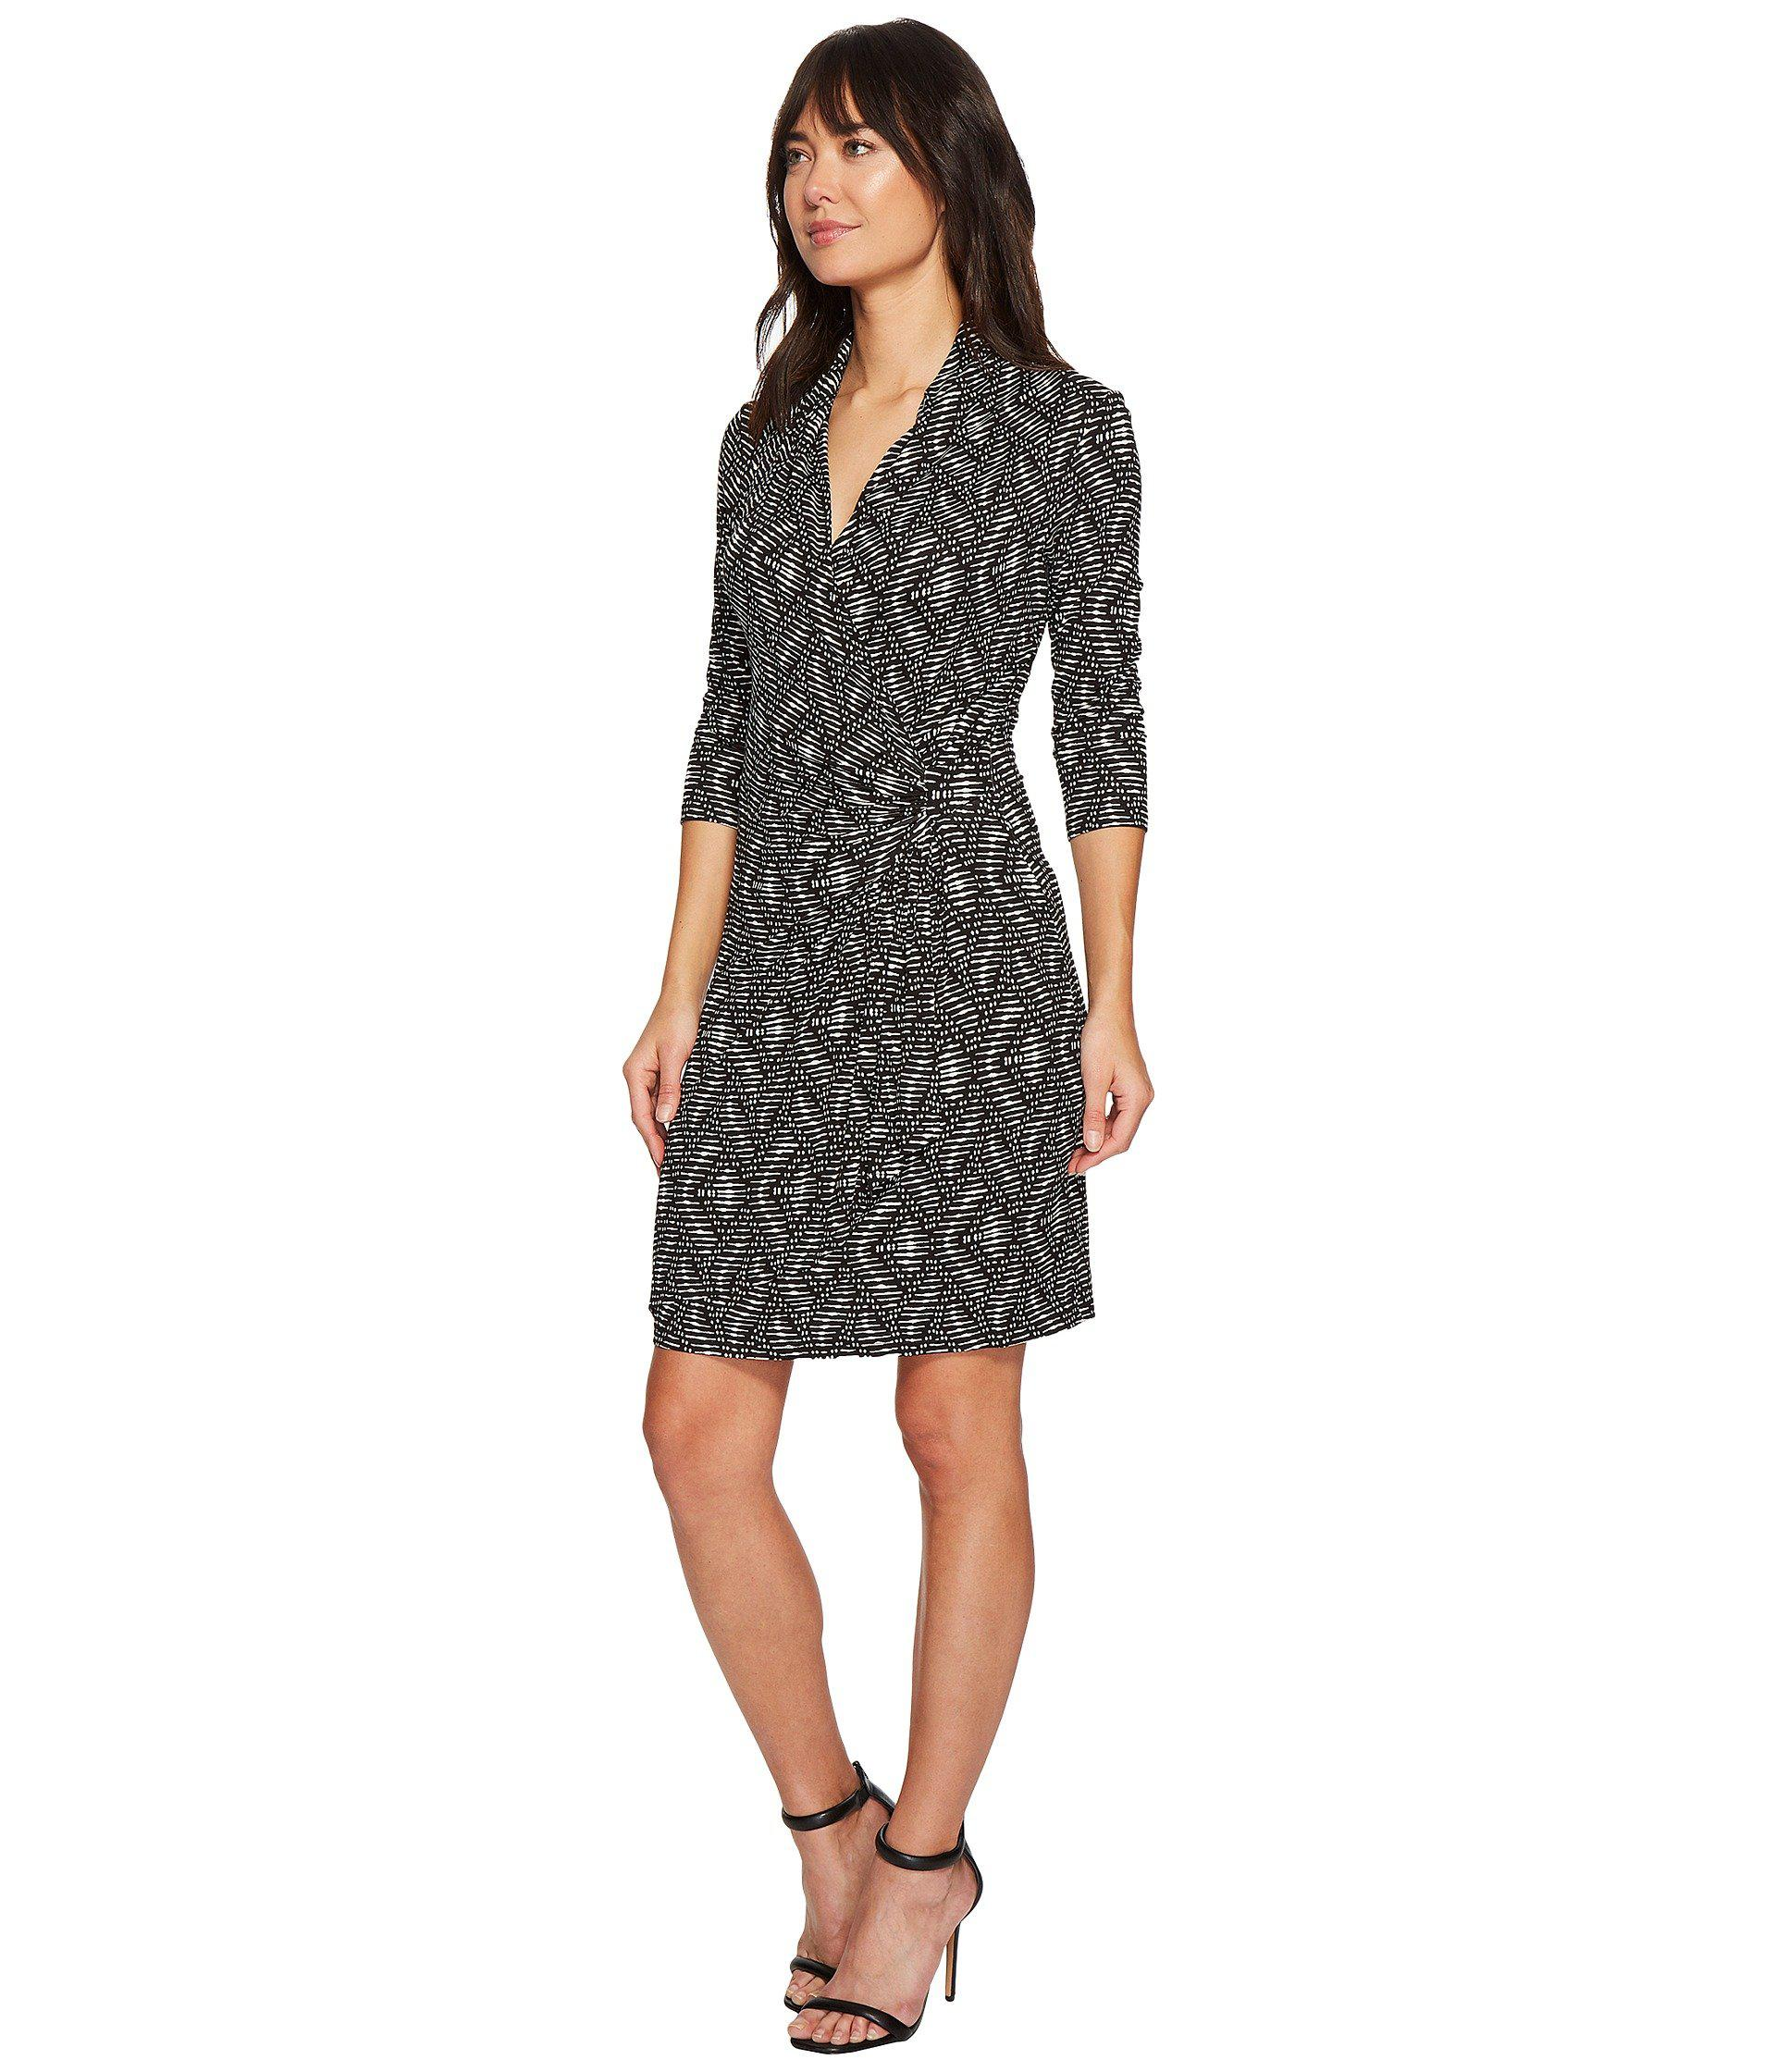 51c4957e3f3 Lyst - Karen Kane 3 4 Sleeve Cascade Wrap Dress in Black - Save  54.54545454545455%